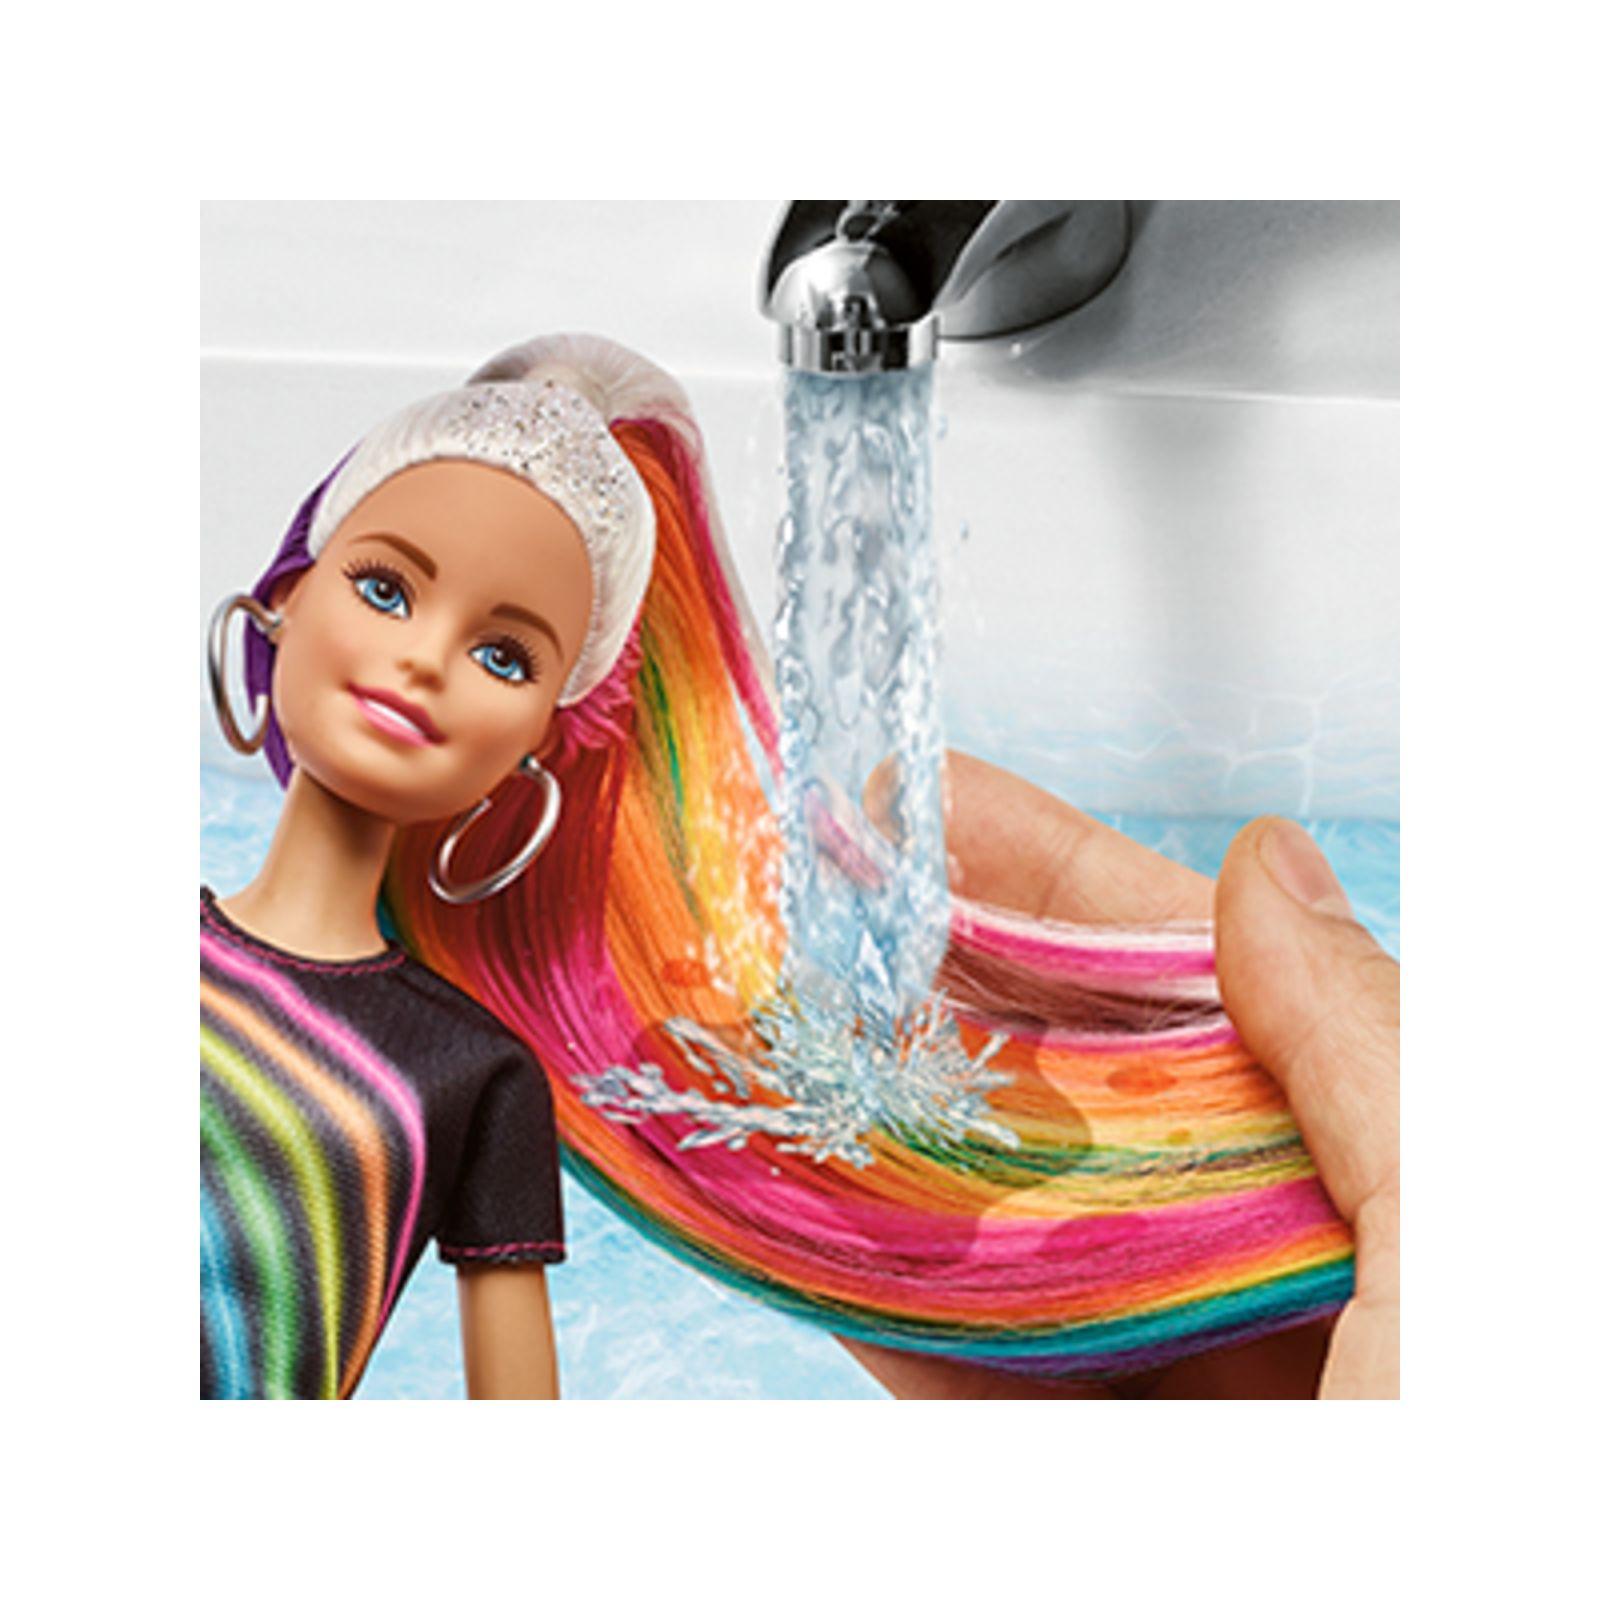 Barbie capelli arcobaleno -